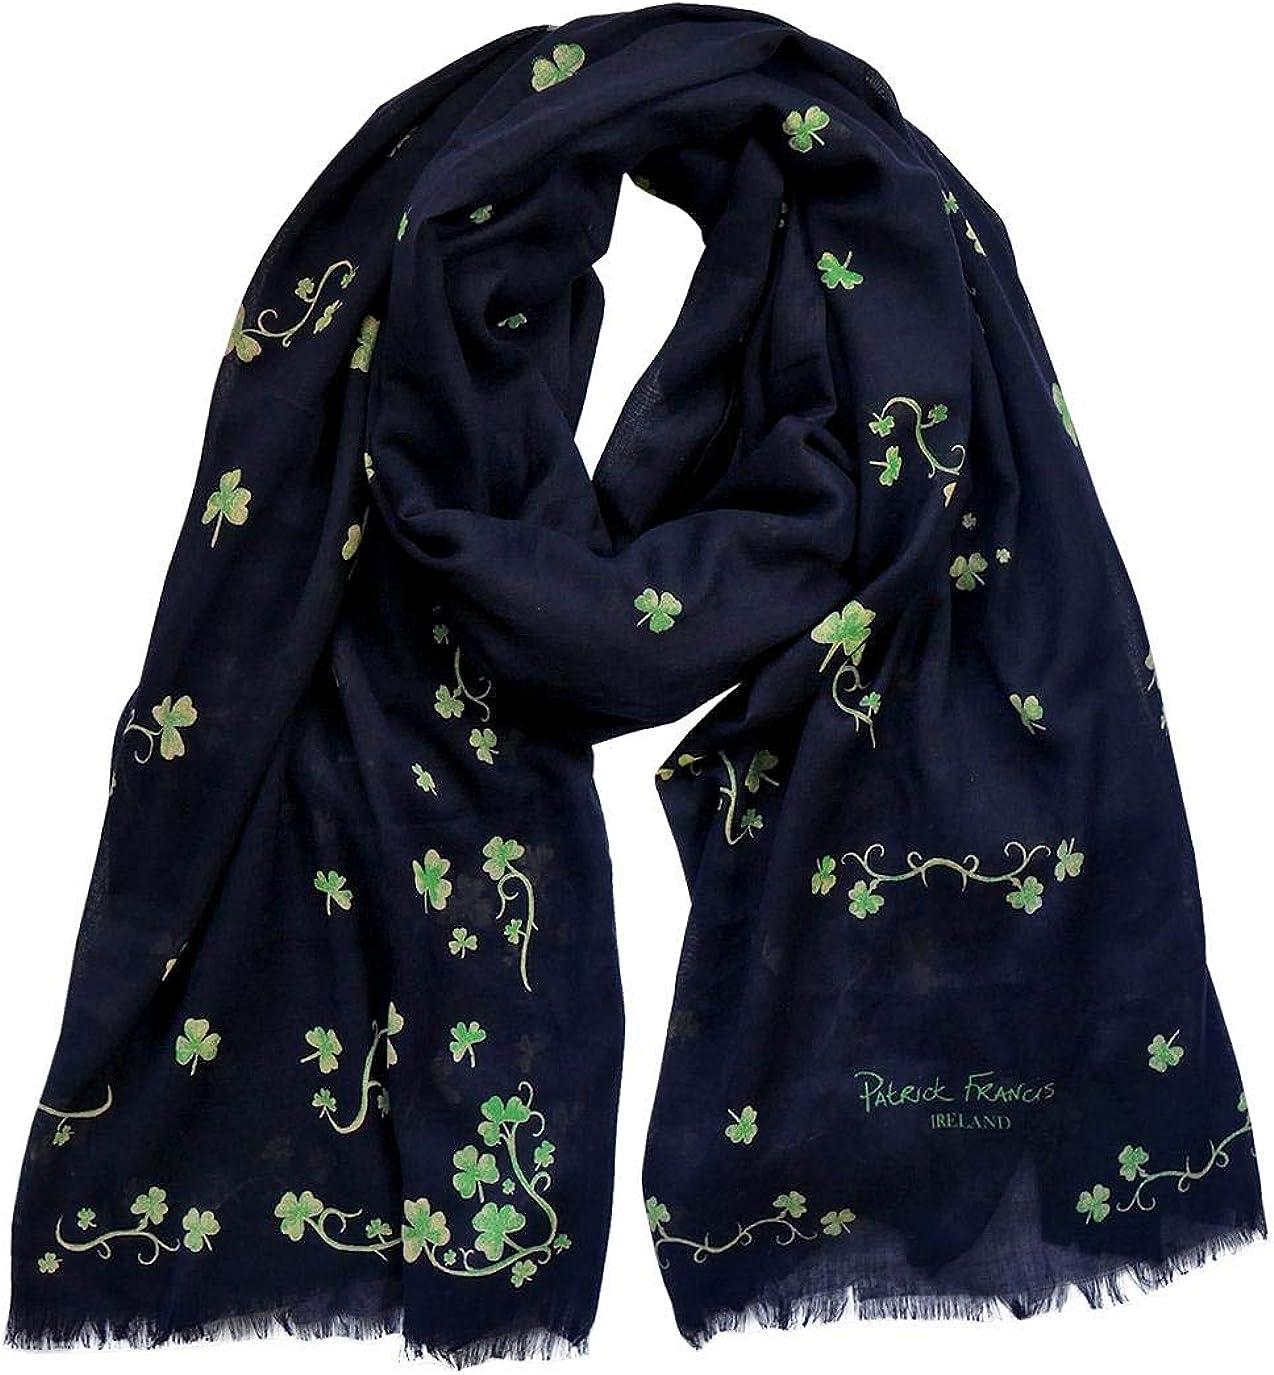 Patrick Francis Shamrock Designed Fashion Scarf, Navy Colour